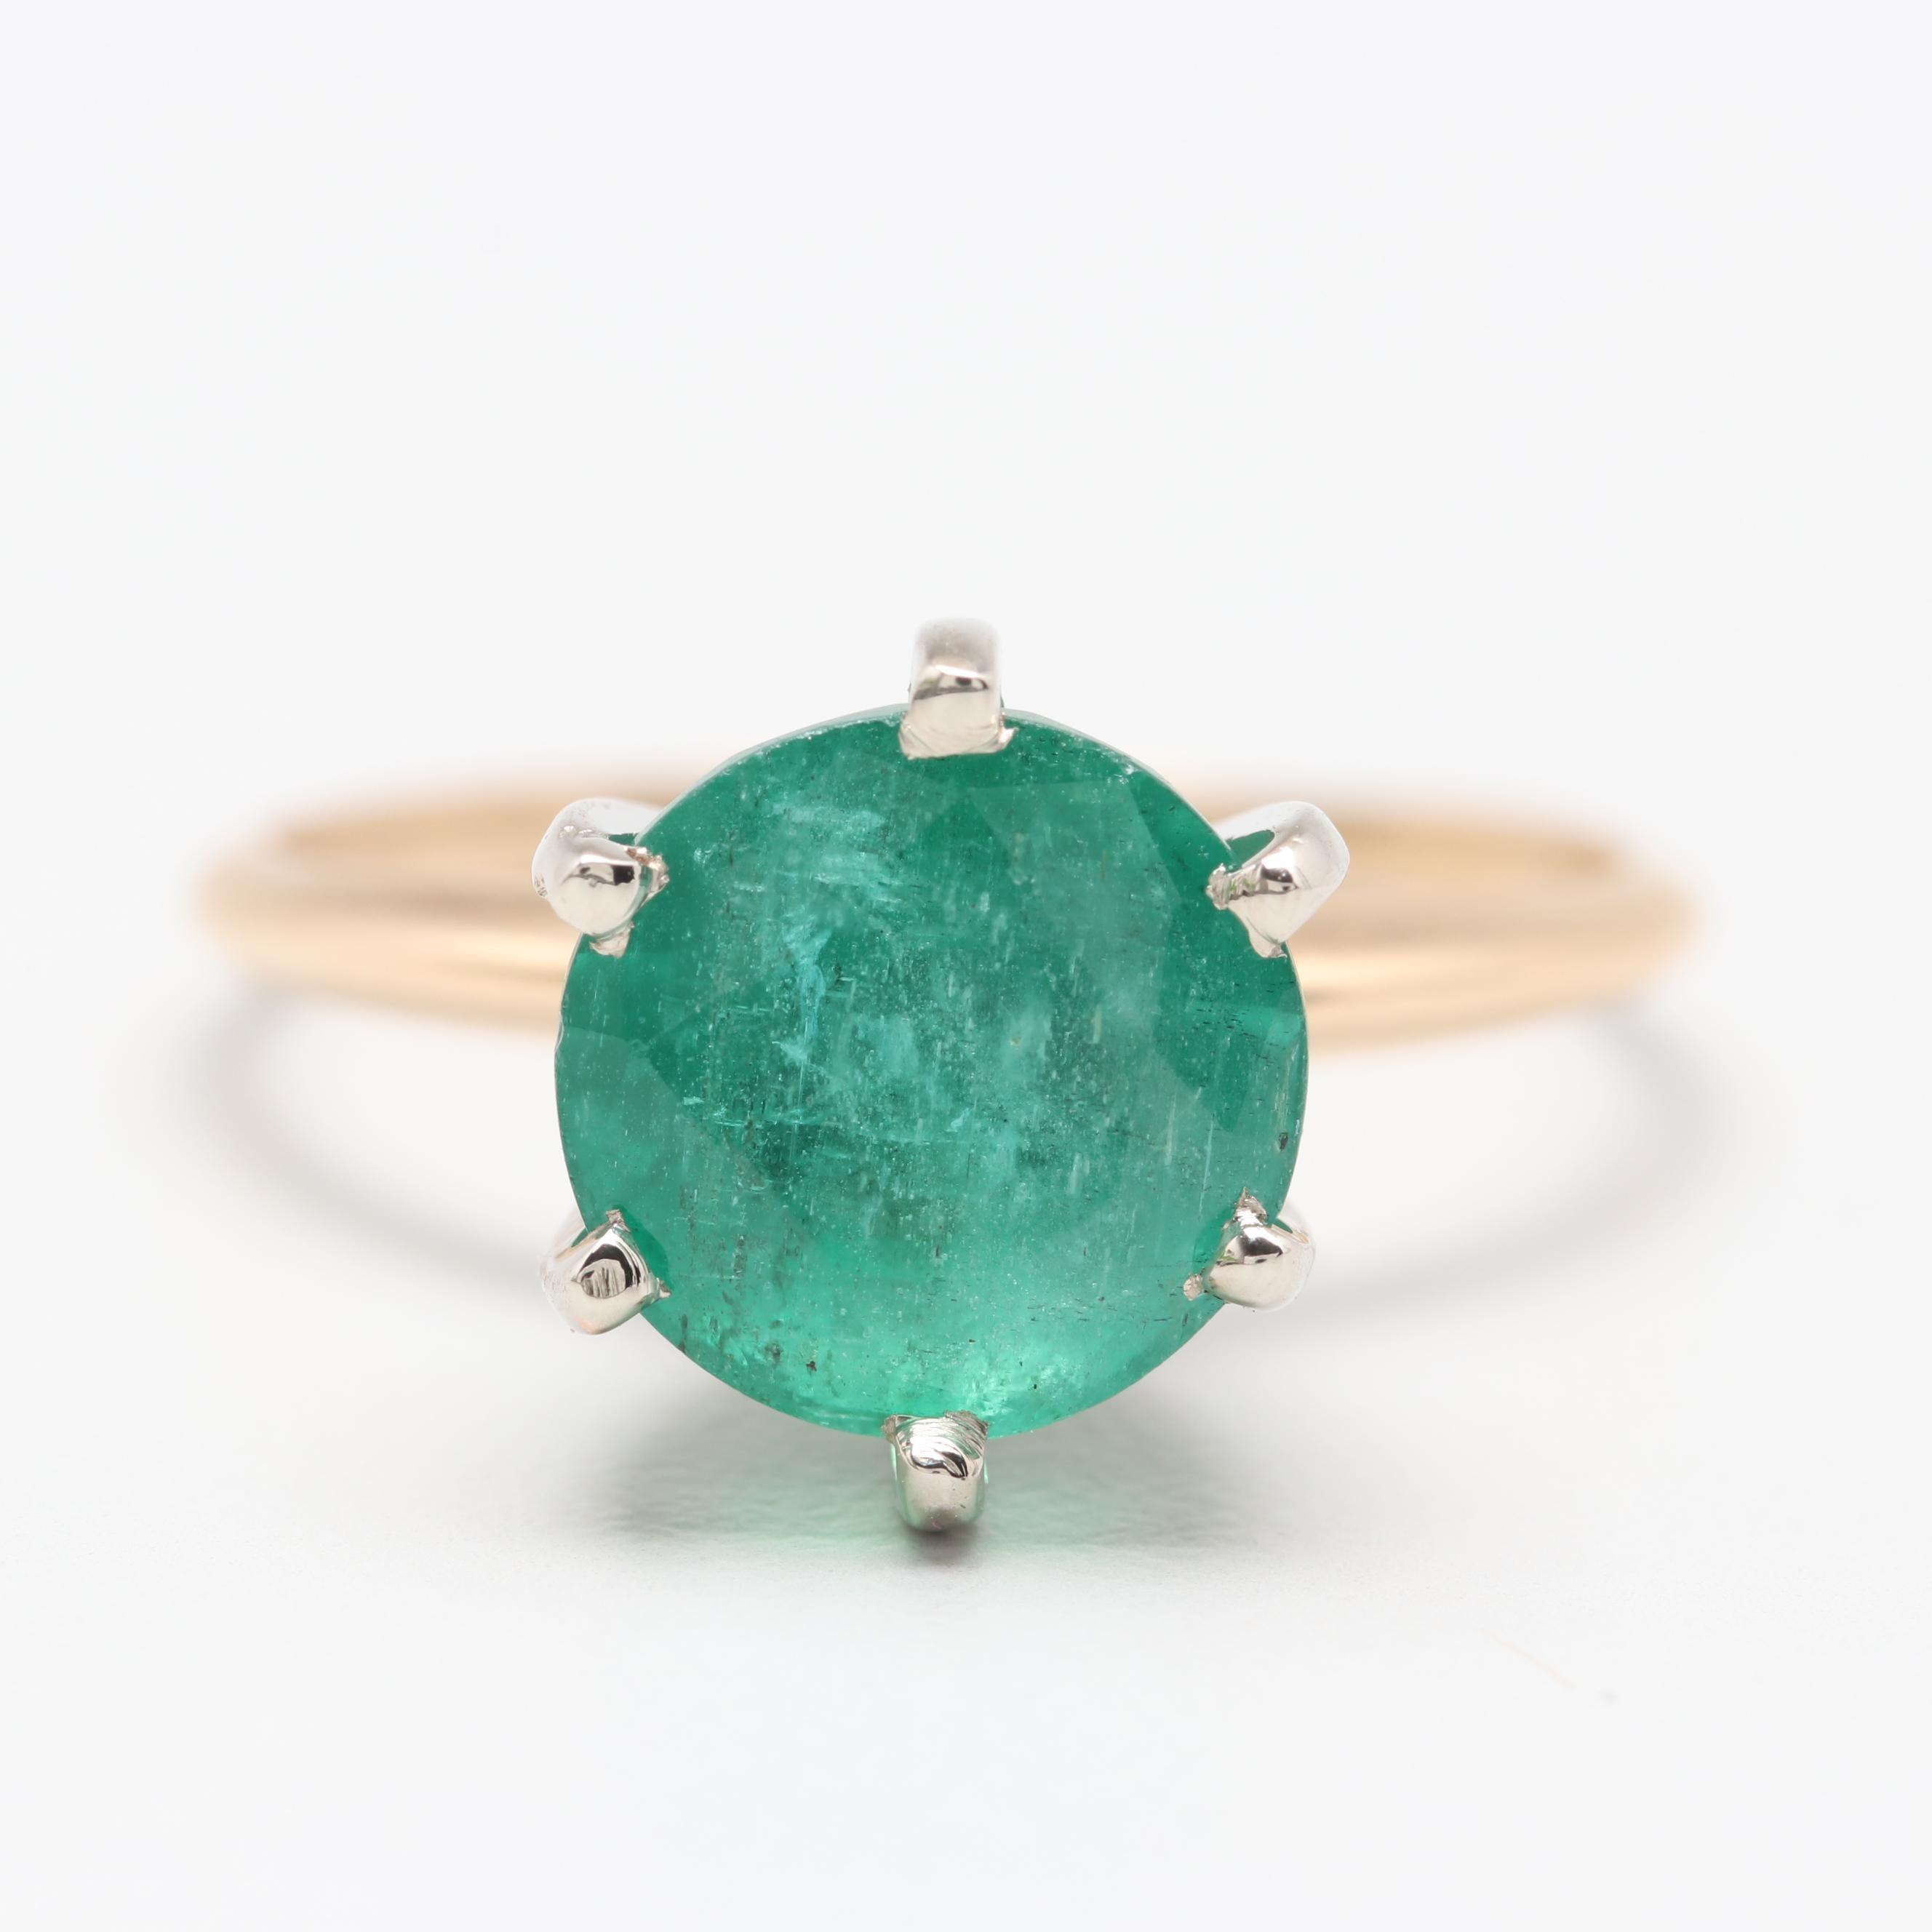 14K Yellow Gold 3.37 CT Emerald Ring